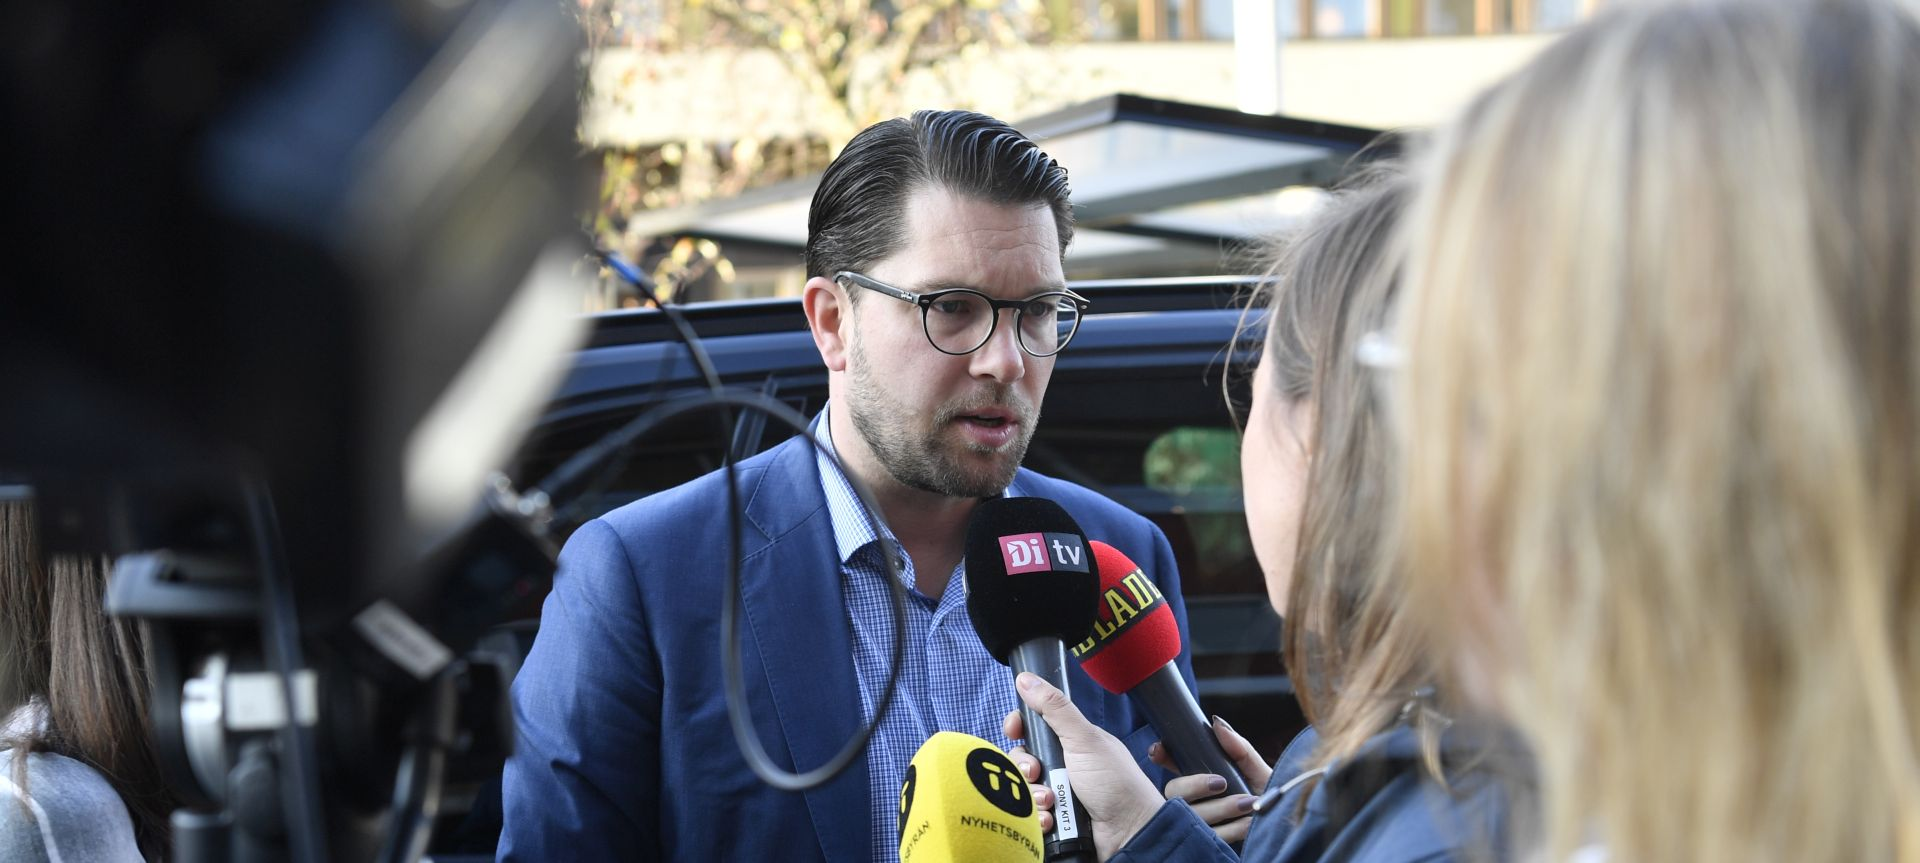 Švedski desni centar želi preuzeti vlast